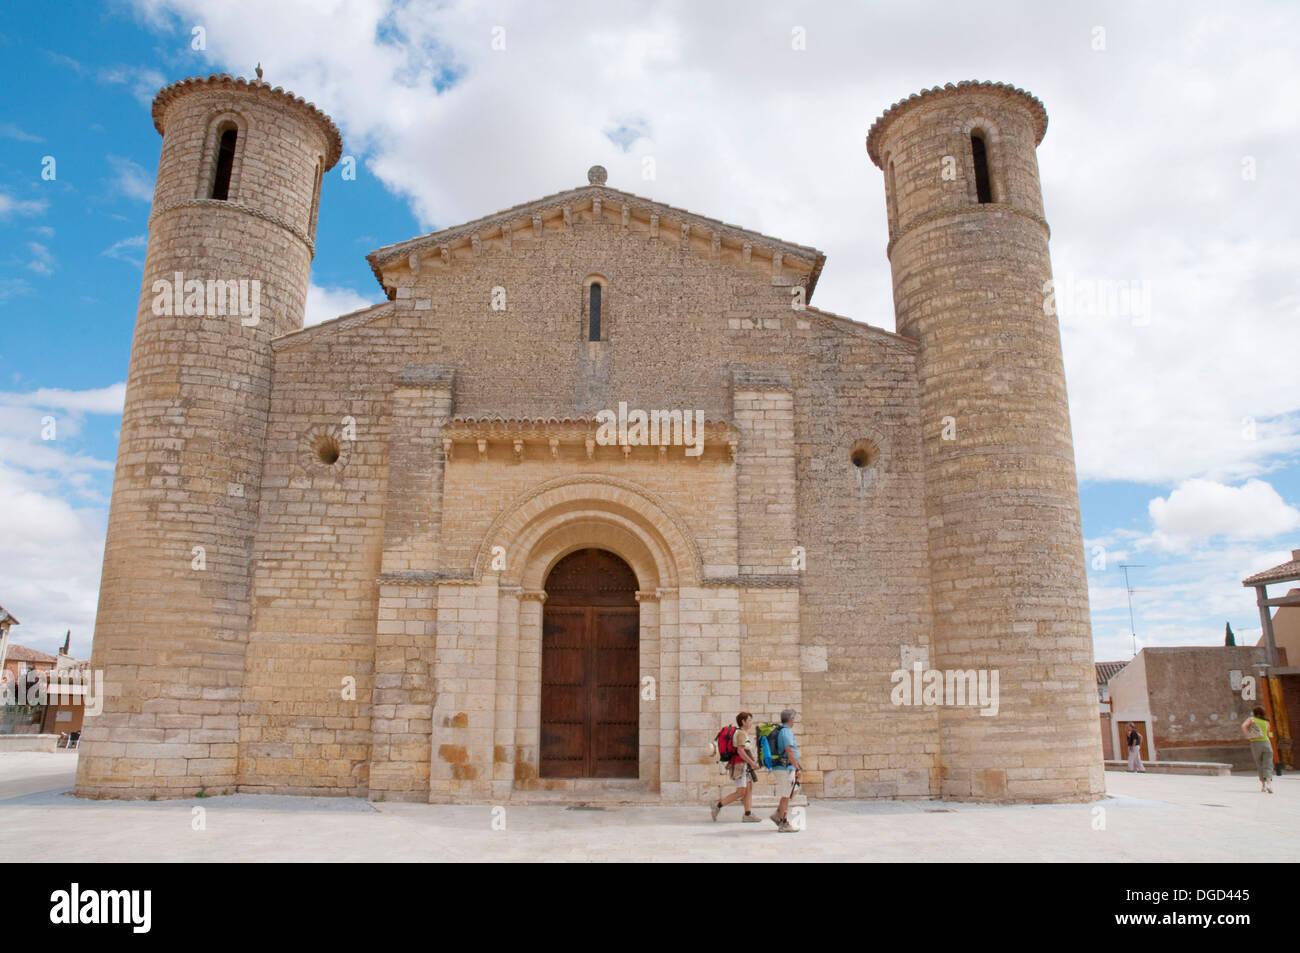 Facade of San Martín church and two pilgrims. Frómista, Palencia province, Castilla León, Spain. Stock Photo